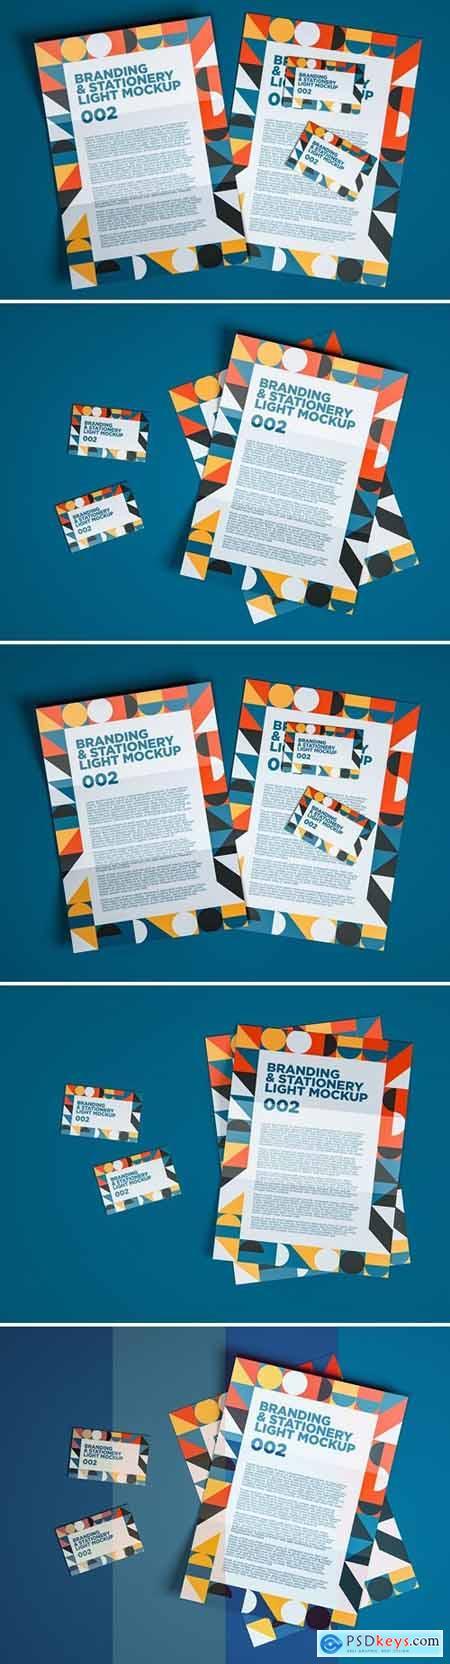 Branding & Stationery Light Mockup 002